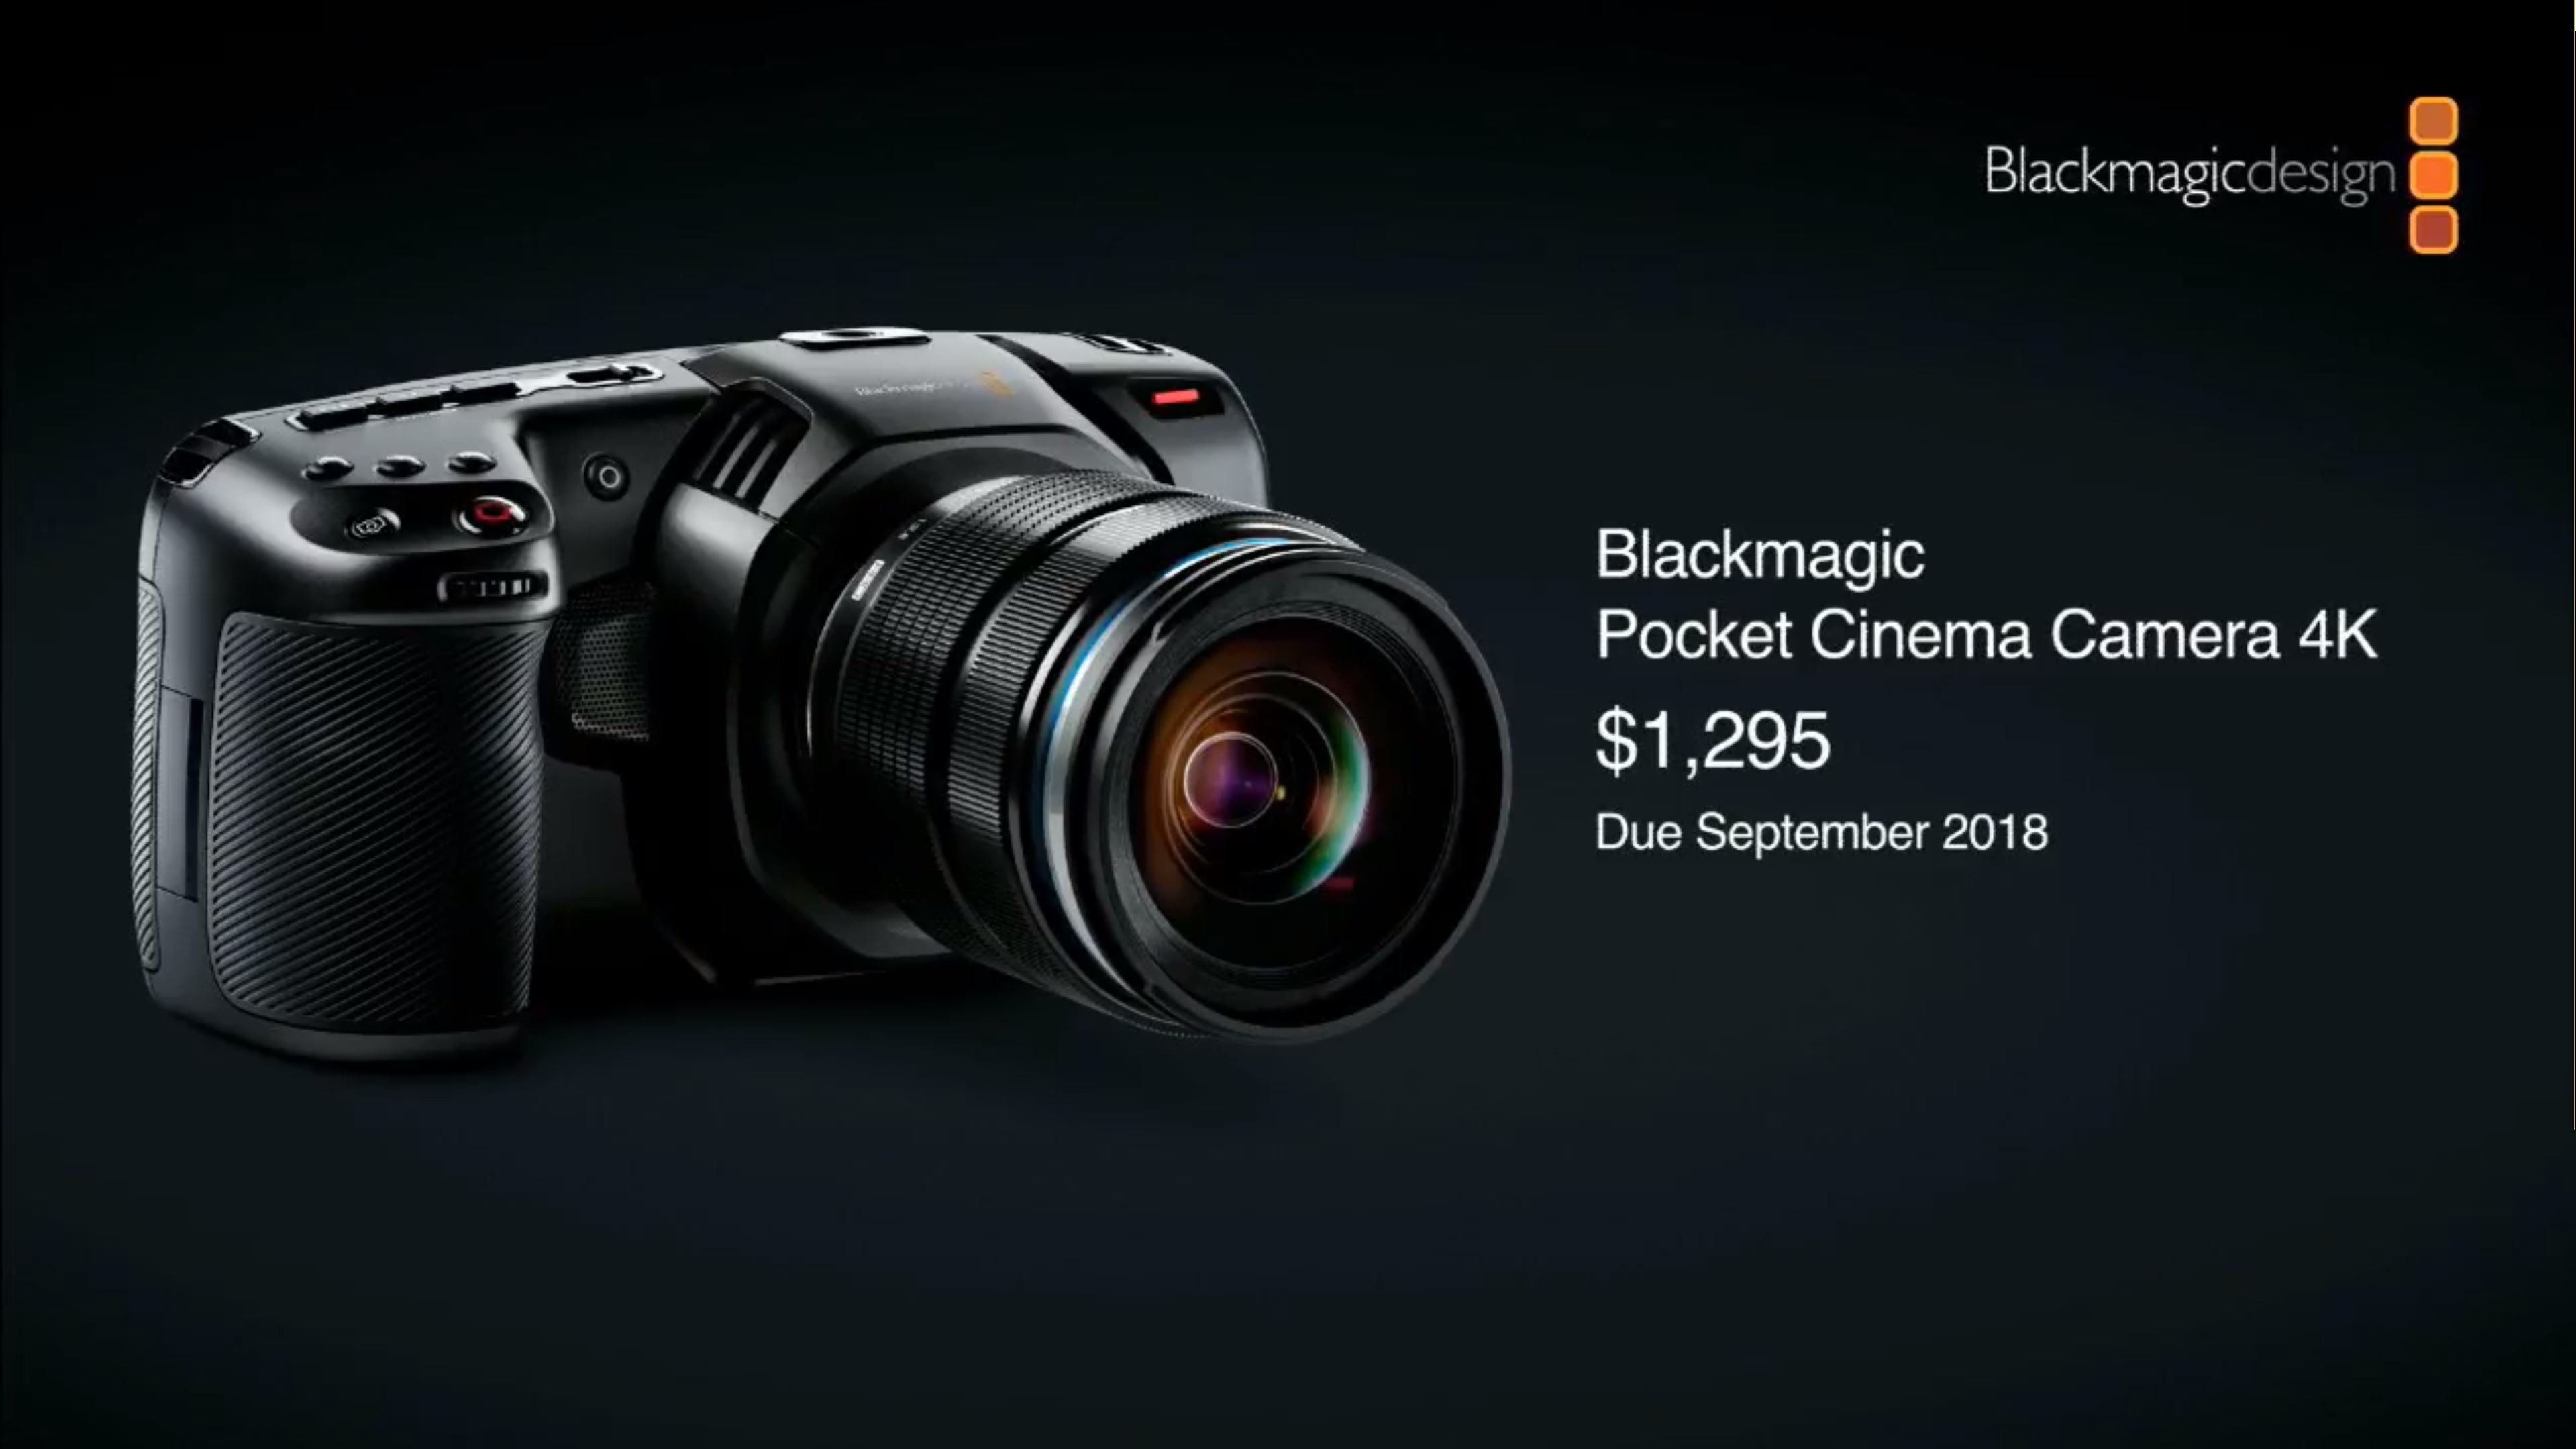 Blackmagic Pocket Cinema Camera 4K is here! | FocusPulling (.com)